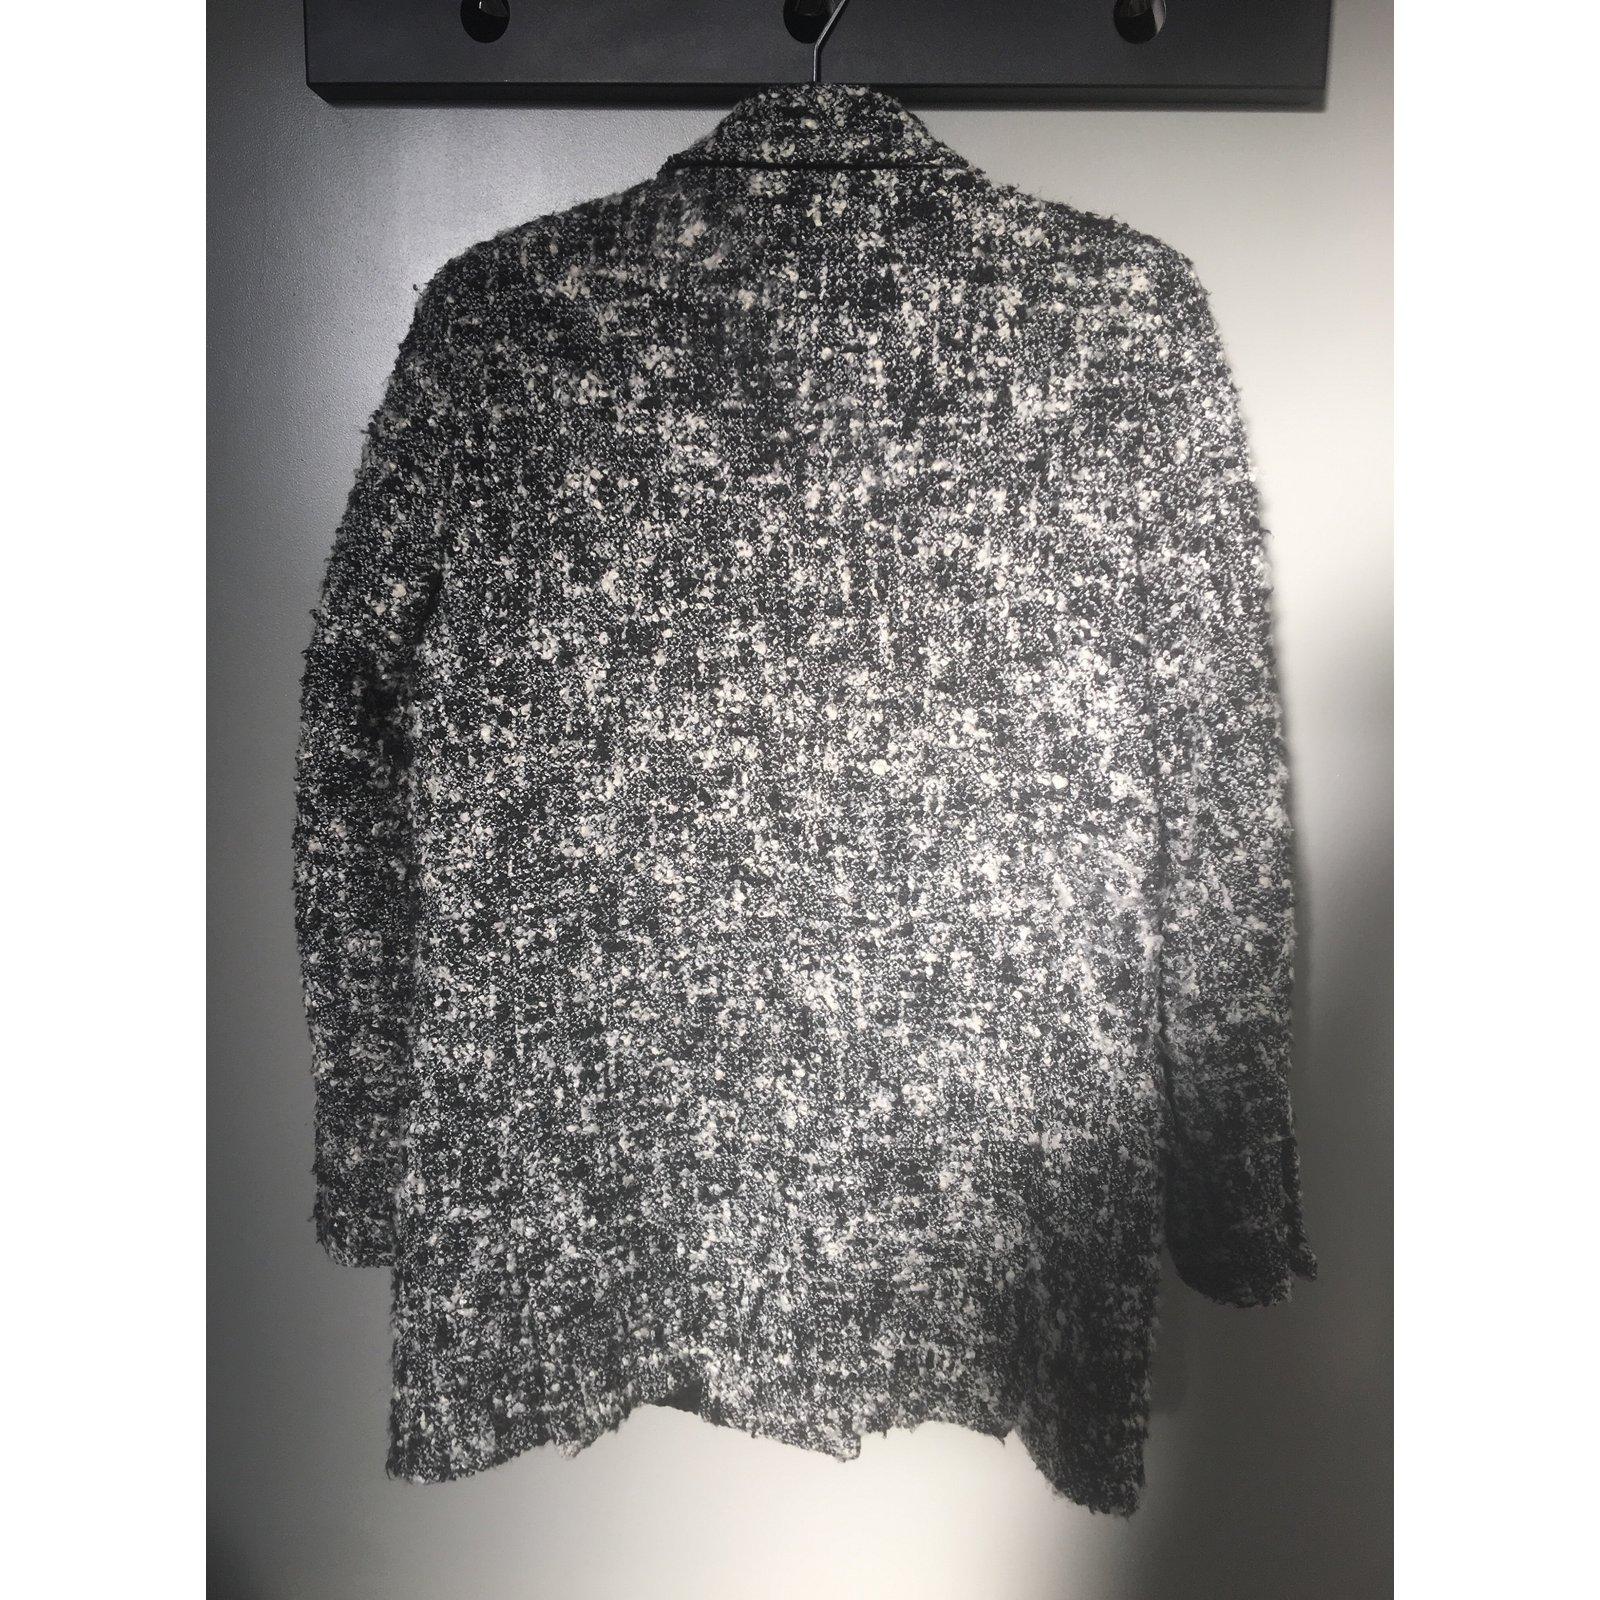 51579 Joli Kooples blanc Tweed Noir The Manteaux Ref gris x07v4Tq